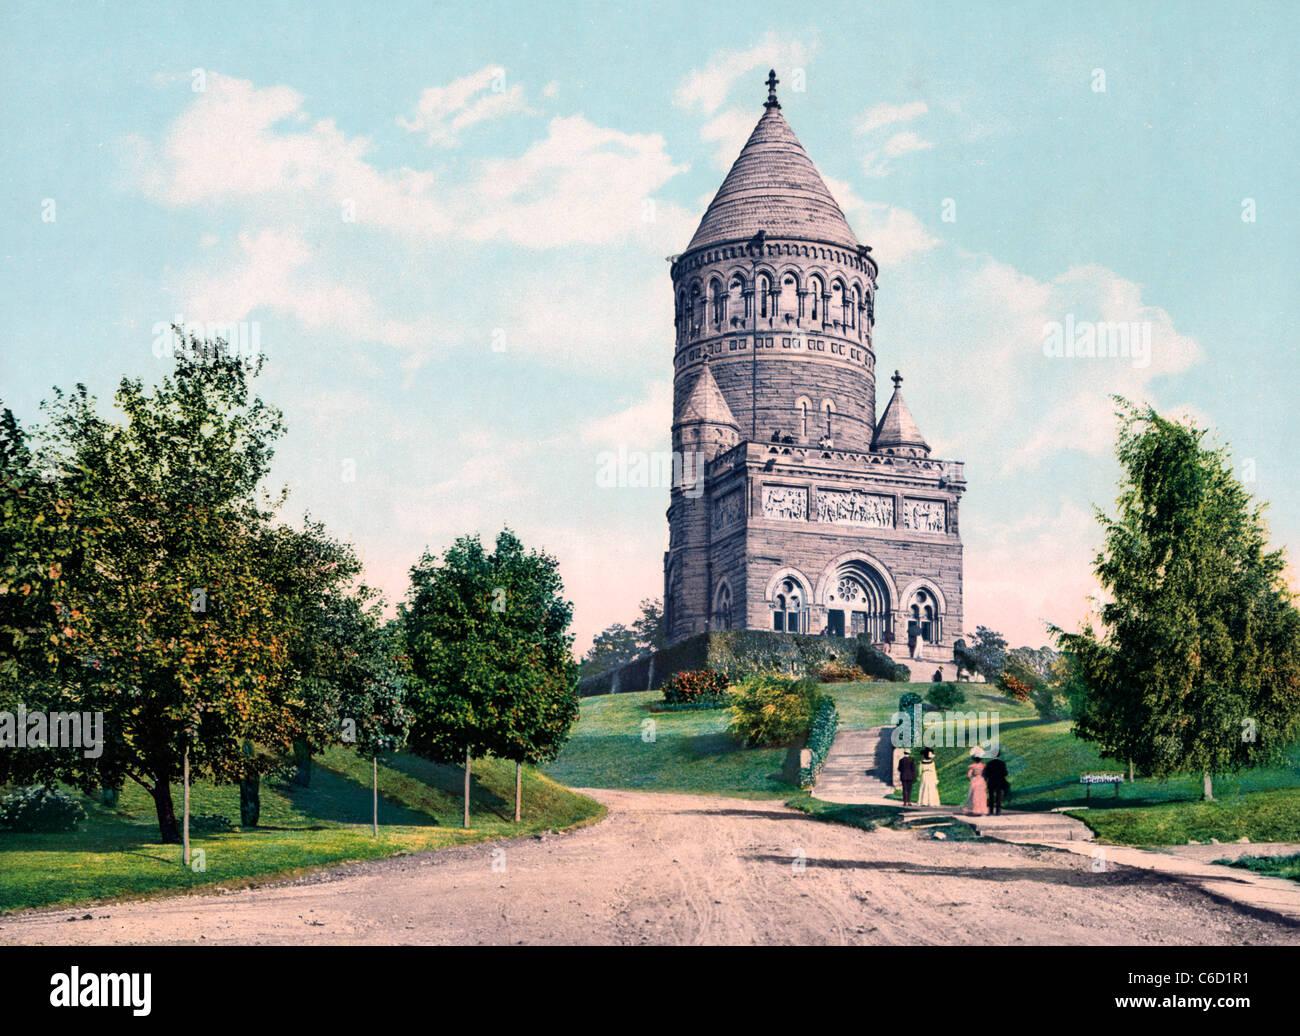 The Garfield Memorial Cleveland Ohio Circa